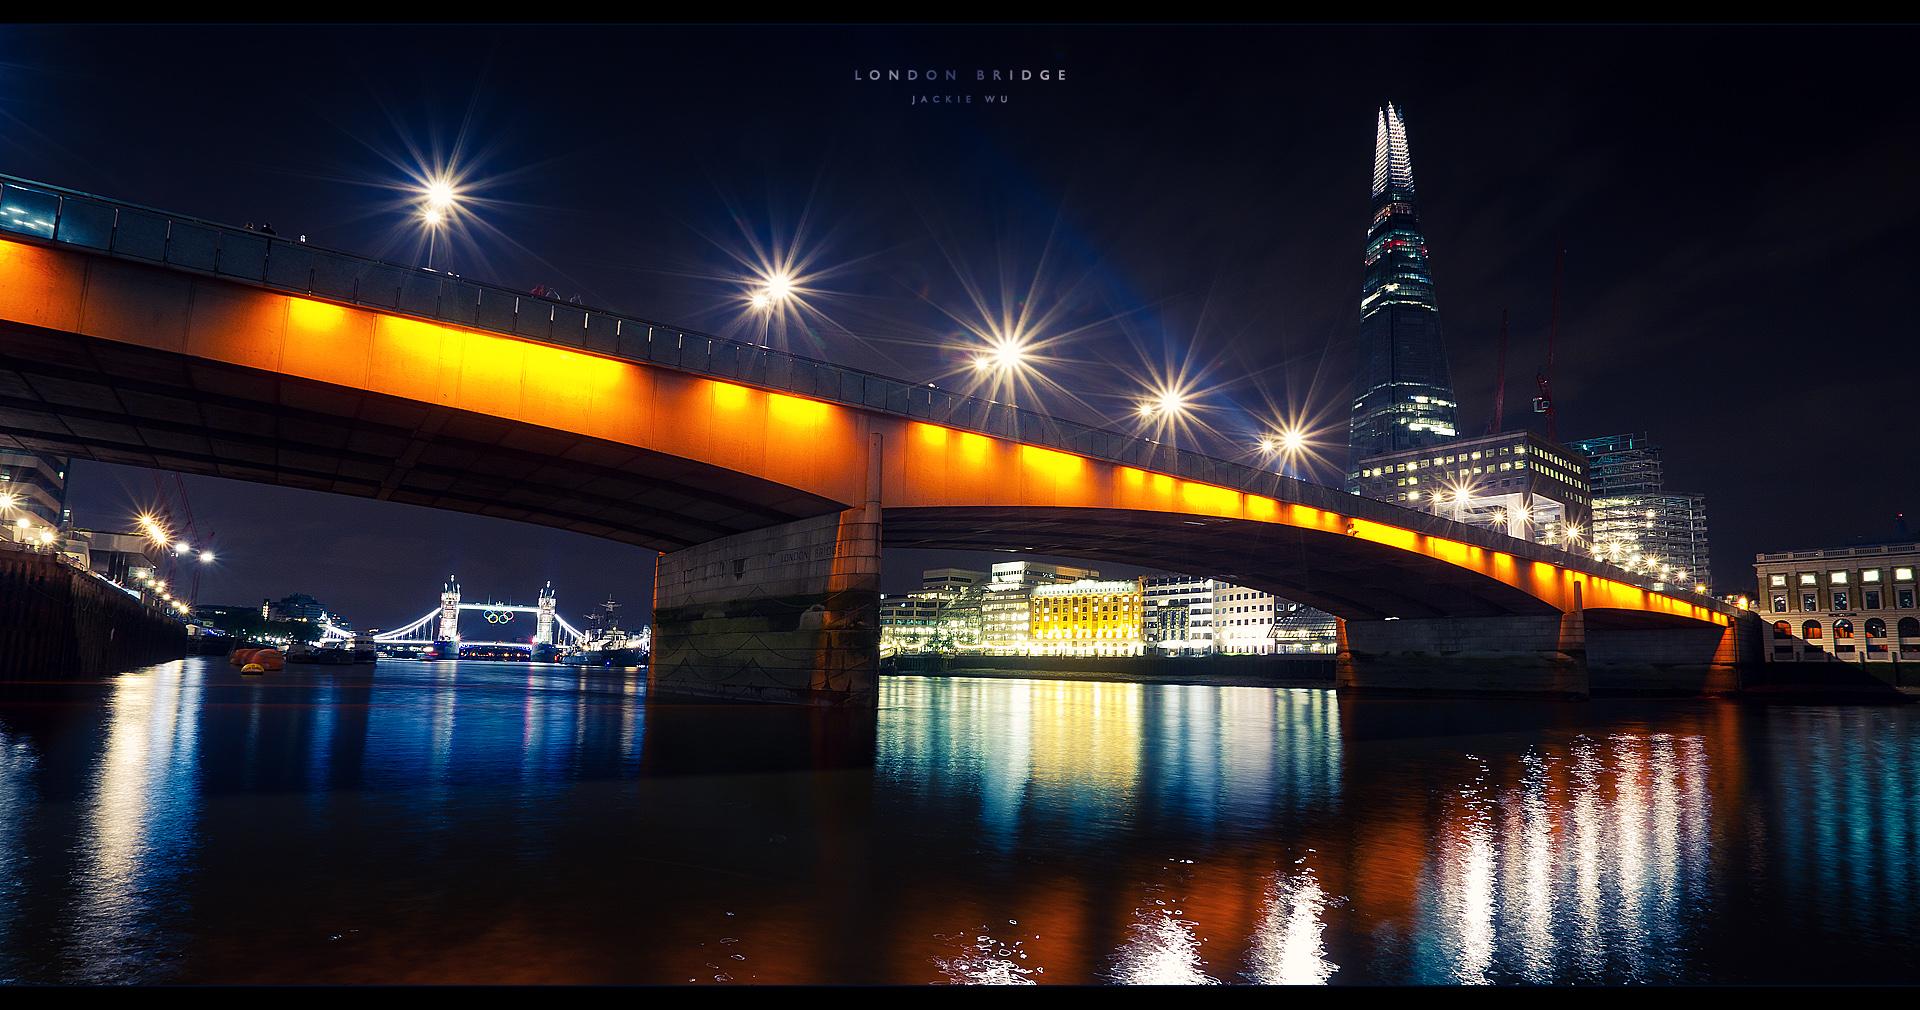 London Bridge by geckokid